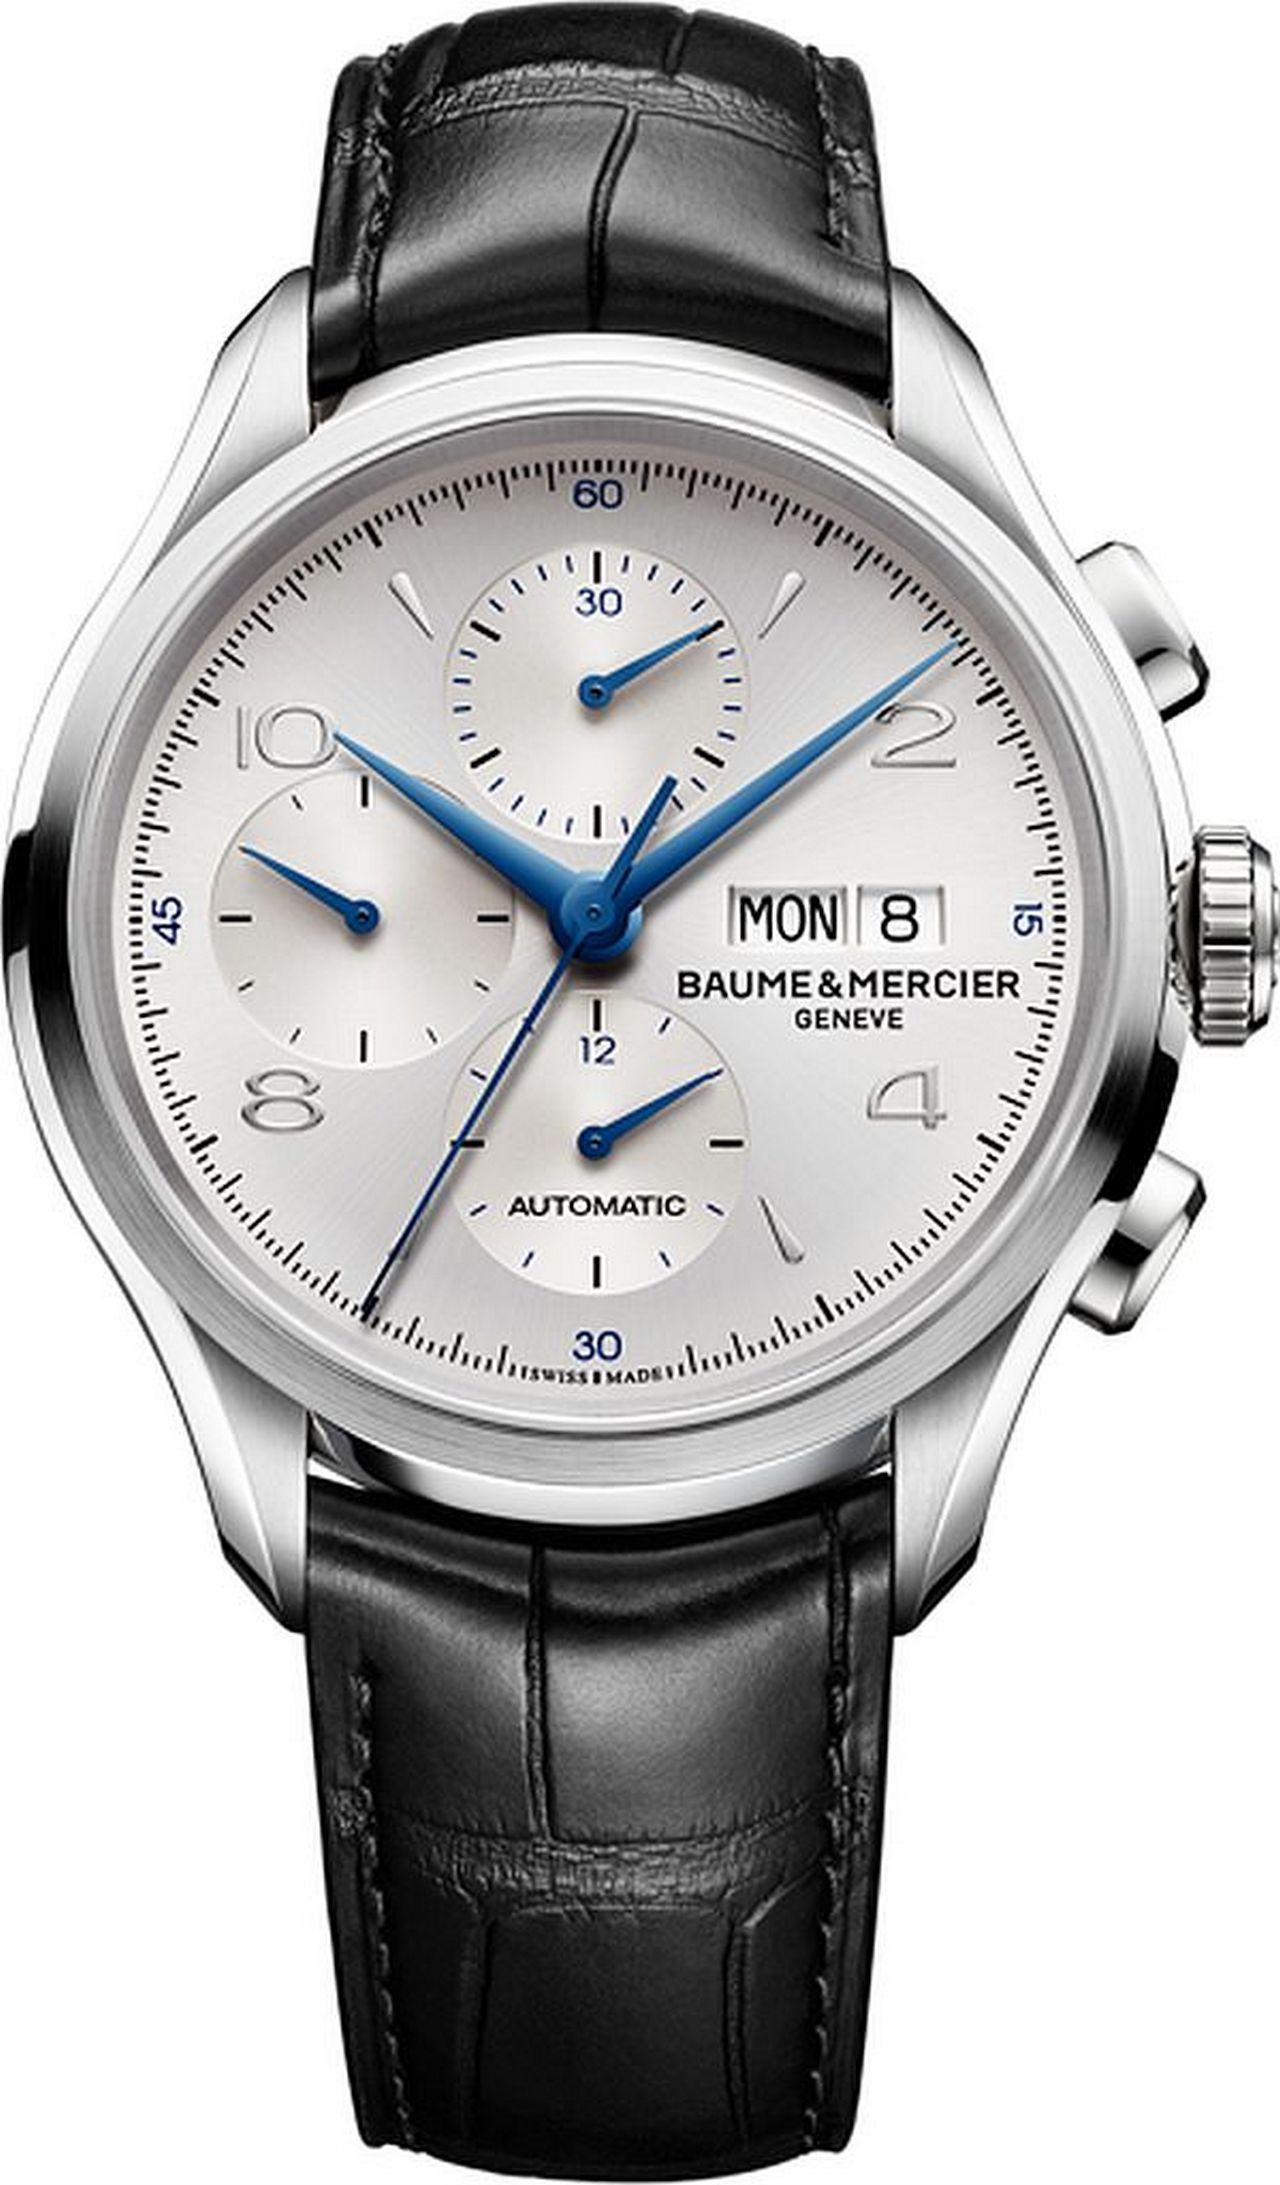 anteprima-sihh-2014-baume-mercier-clifton-chronographs-0-100_